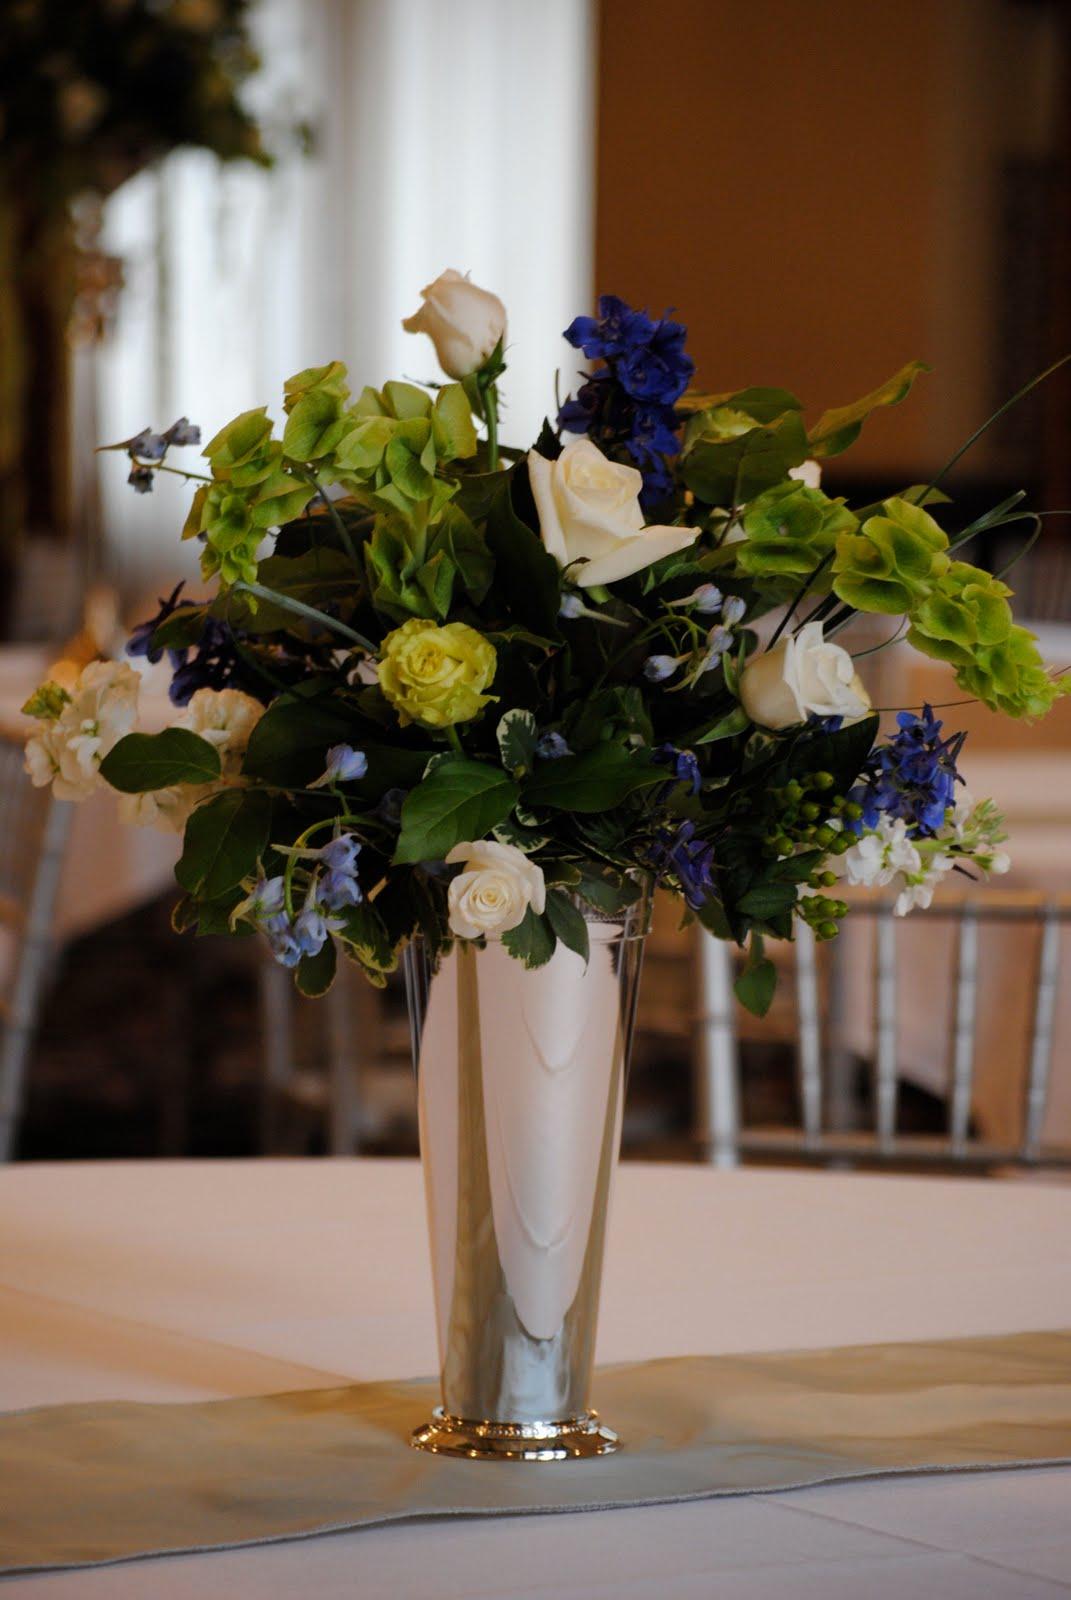 Prestigious Petals Floral The Blog Upscale St Paul Wedding Slate Blue Silver Green White